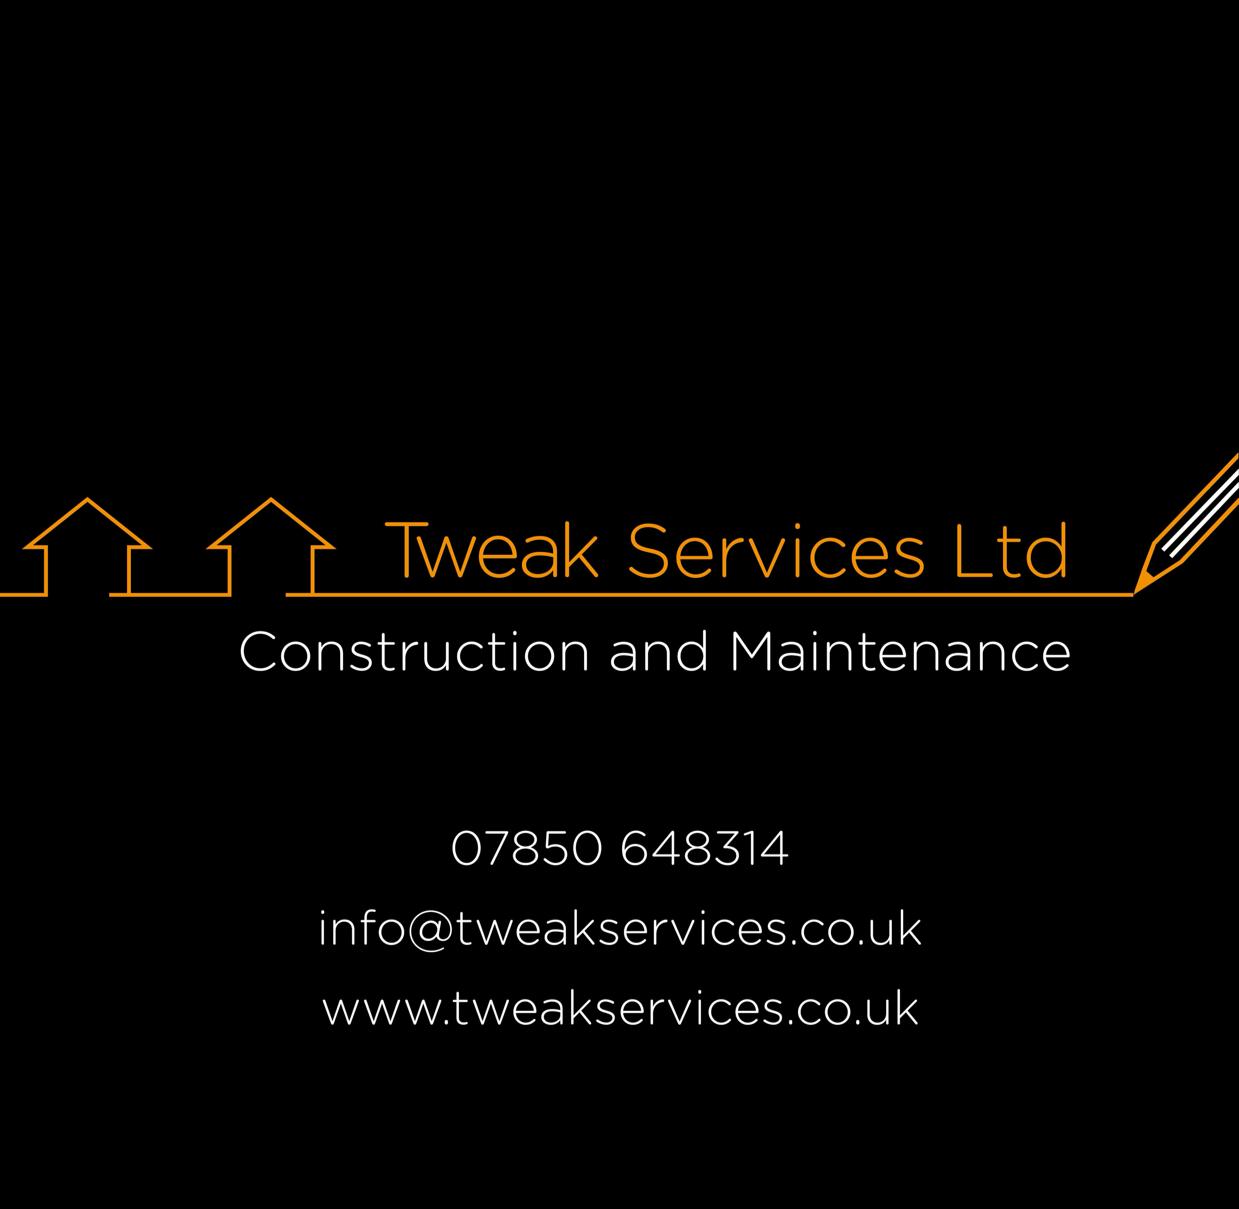 Tweak services limited